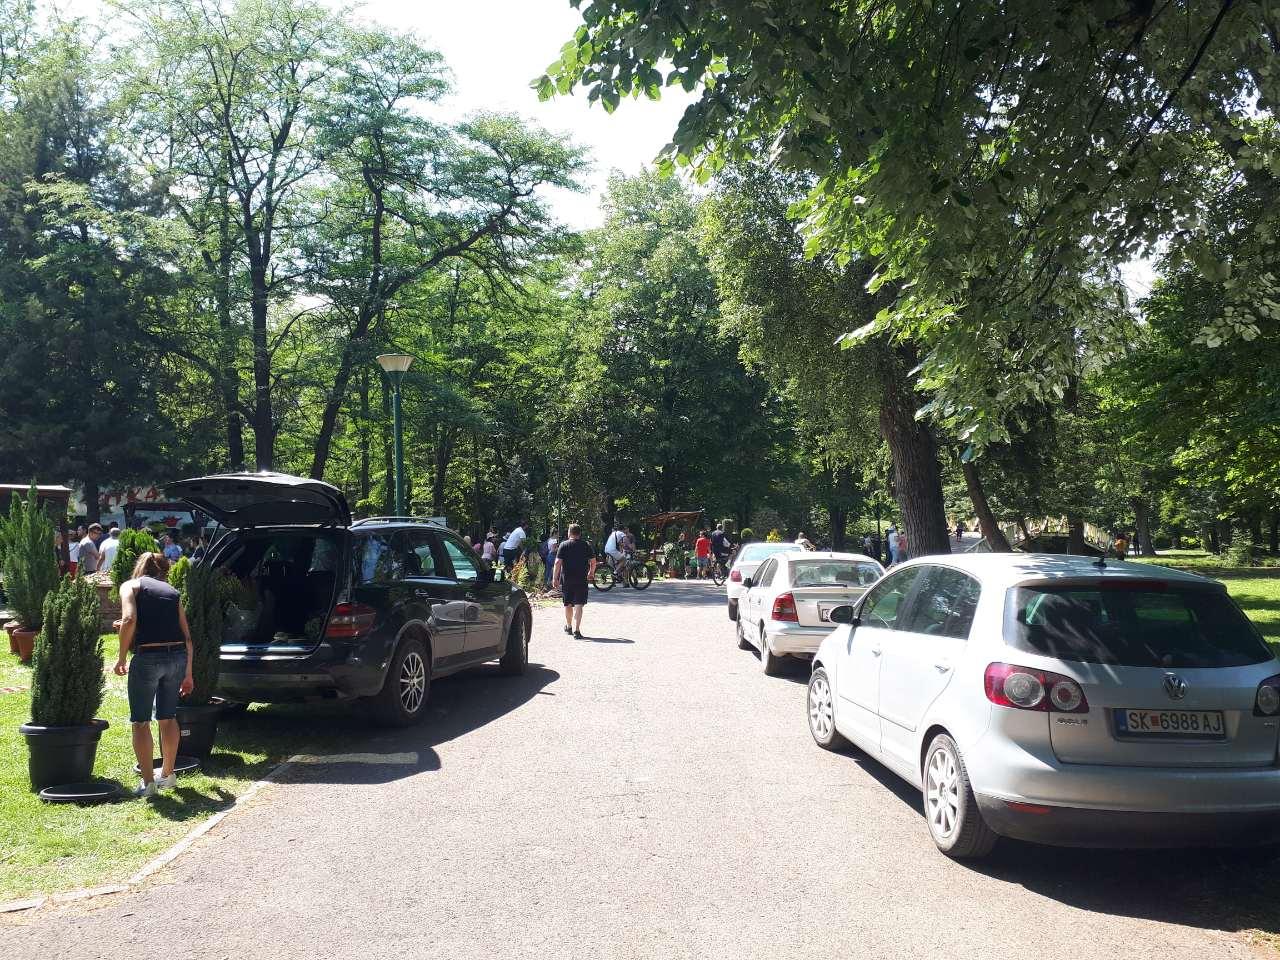 Град Скопје, скопски општини и градоначелници - Page 4 Koli-vo-park